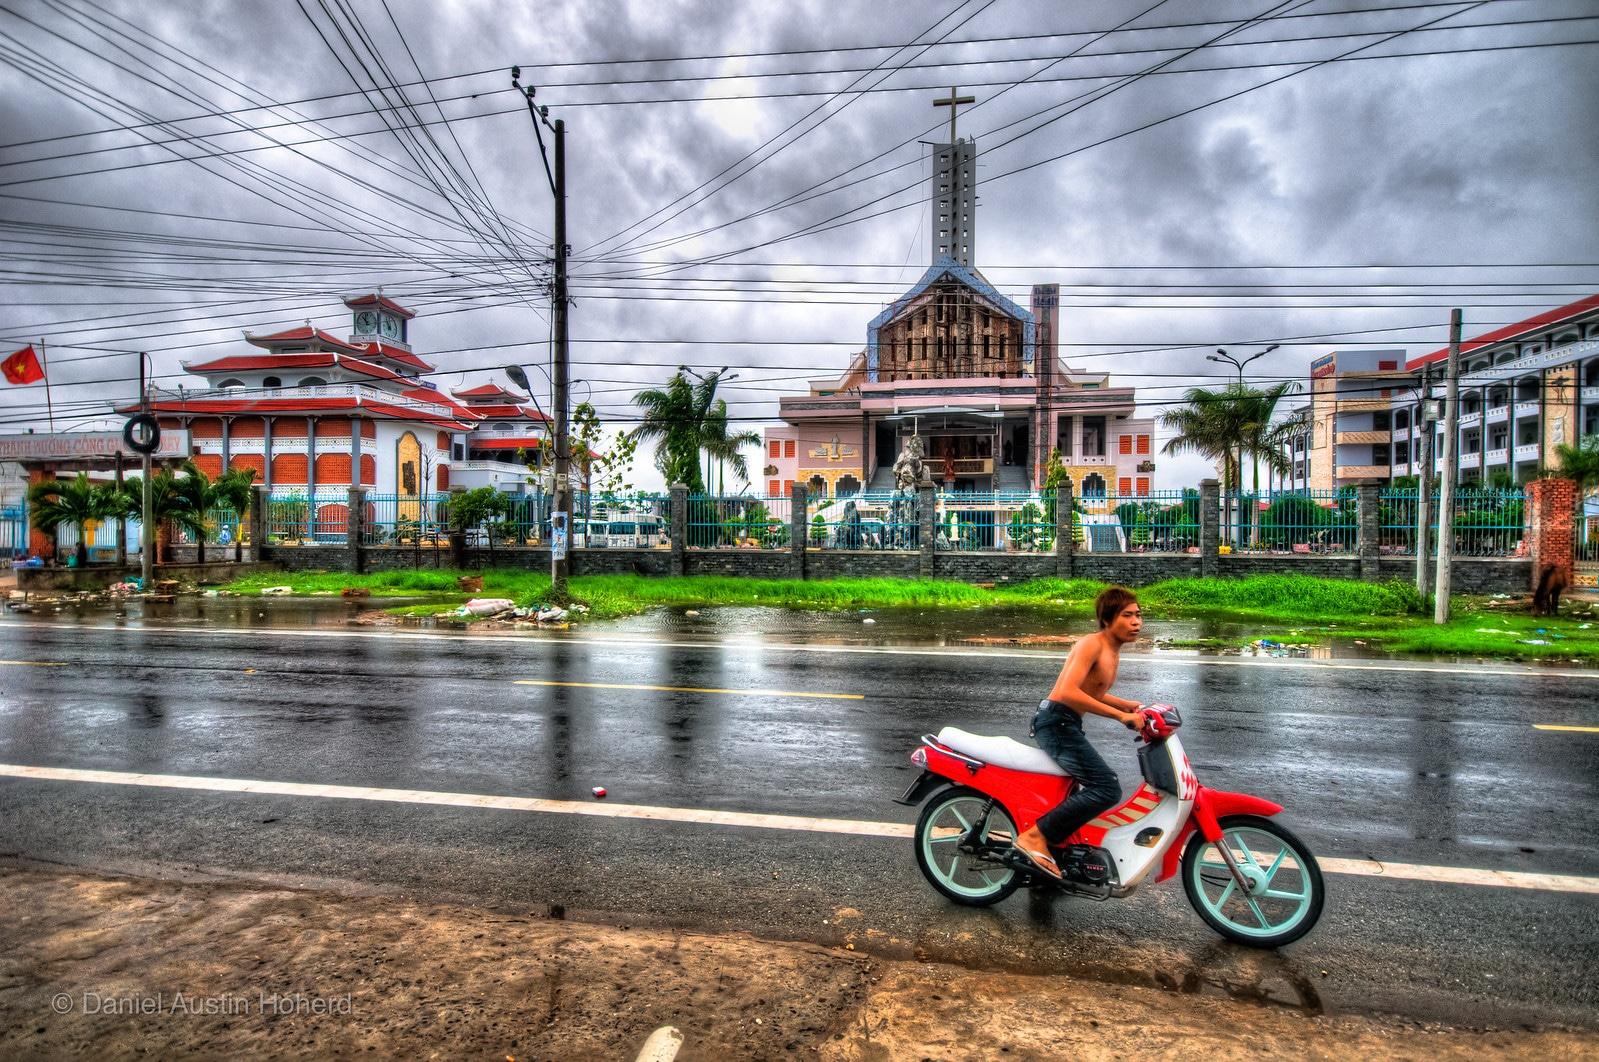 Street in Giá Rai, Bac Liêu Province, Vietnam